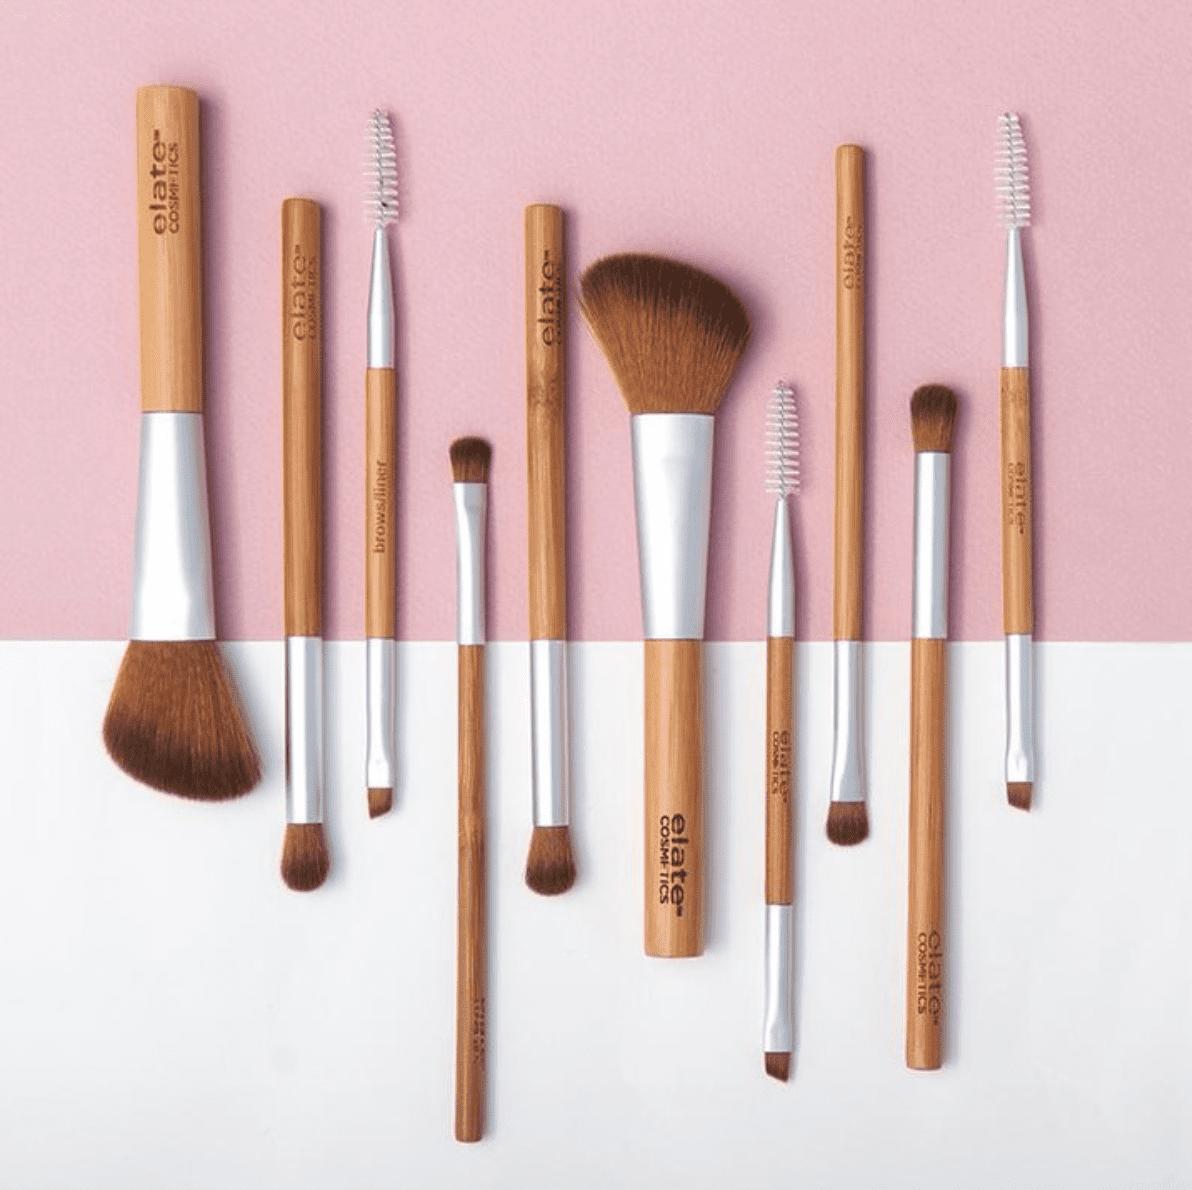 10 Vegan Makeup Brushes To Add To Your Beauty Collection Vegan Makeup Brushes Vegan Makeup Eco Friendly Makeup